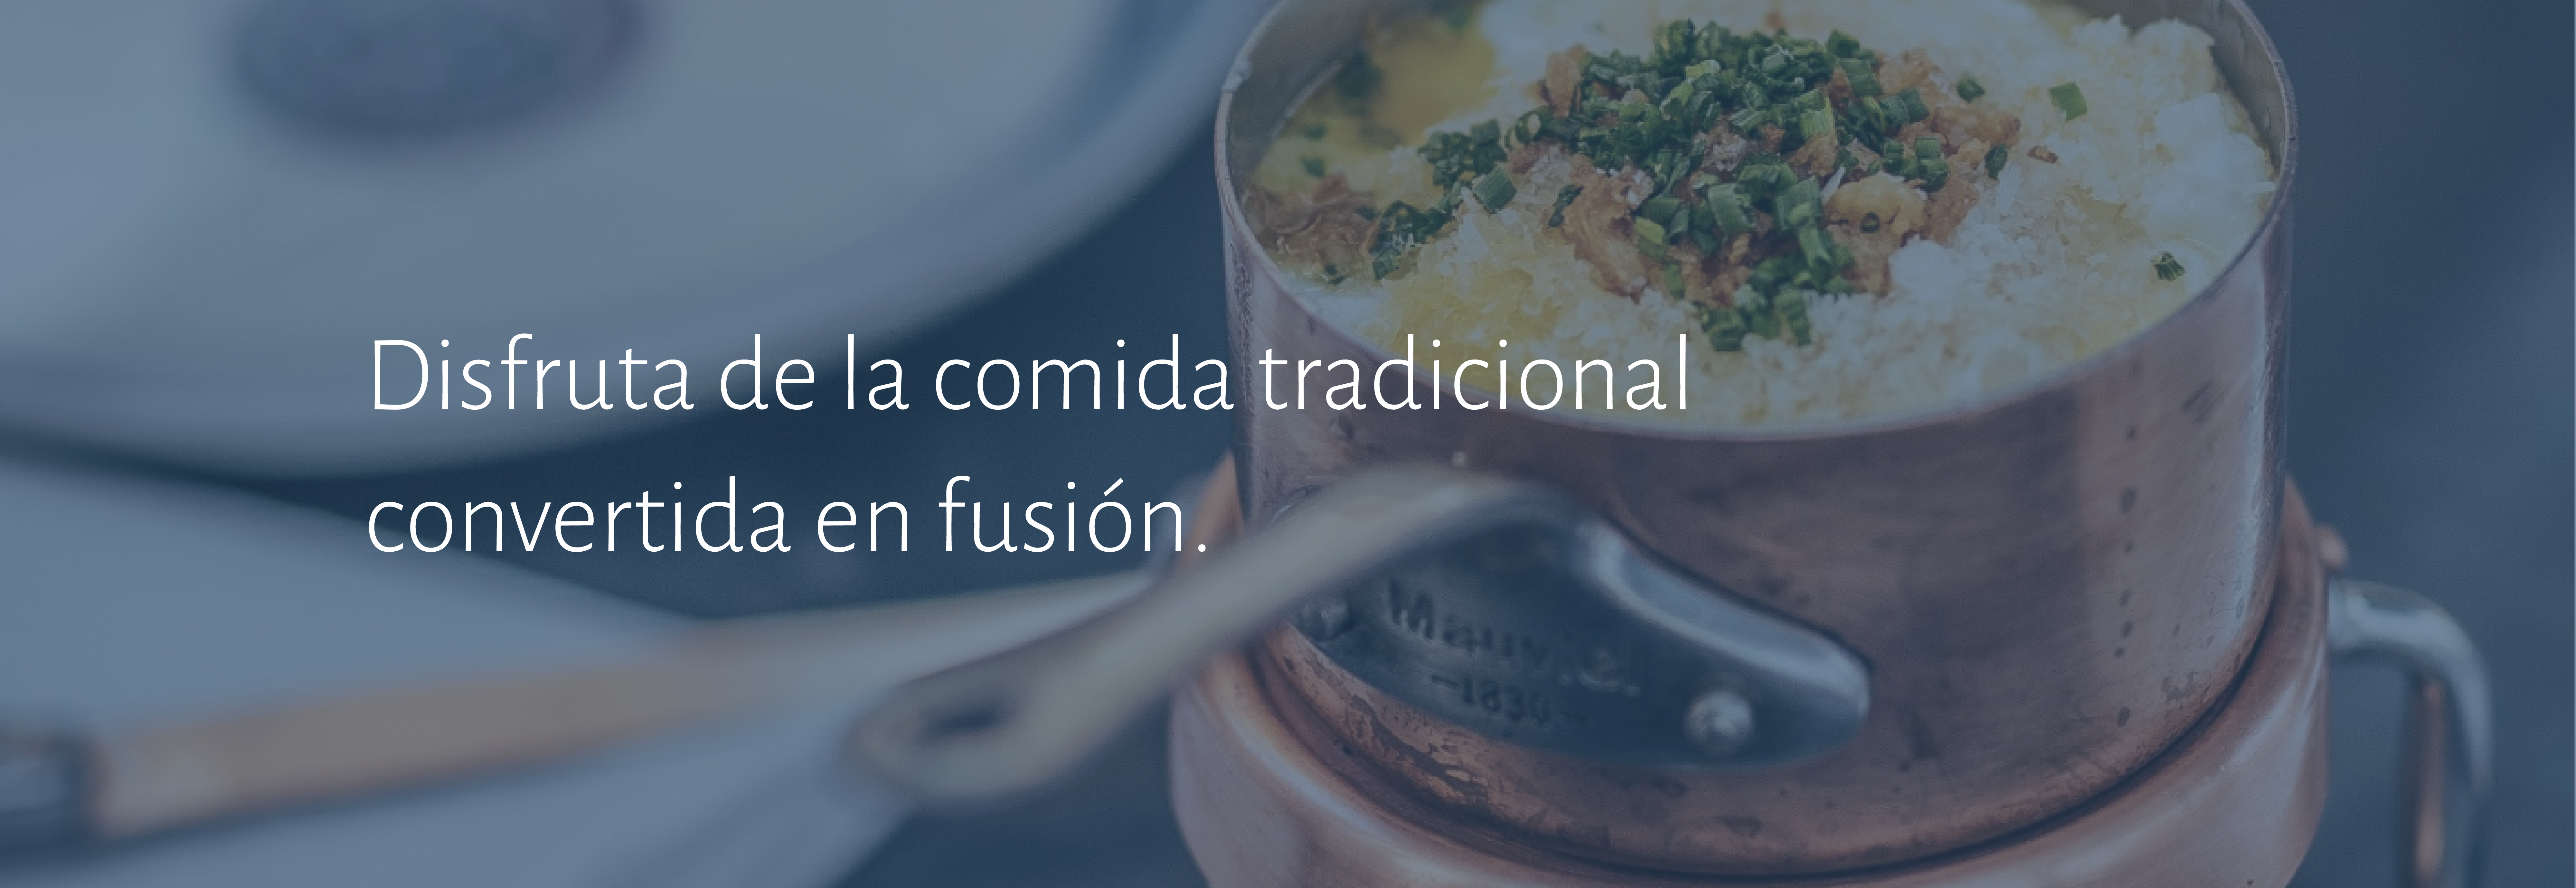 Comida tradicional convertida en fusión